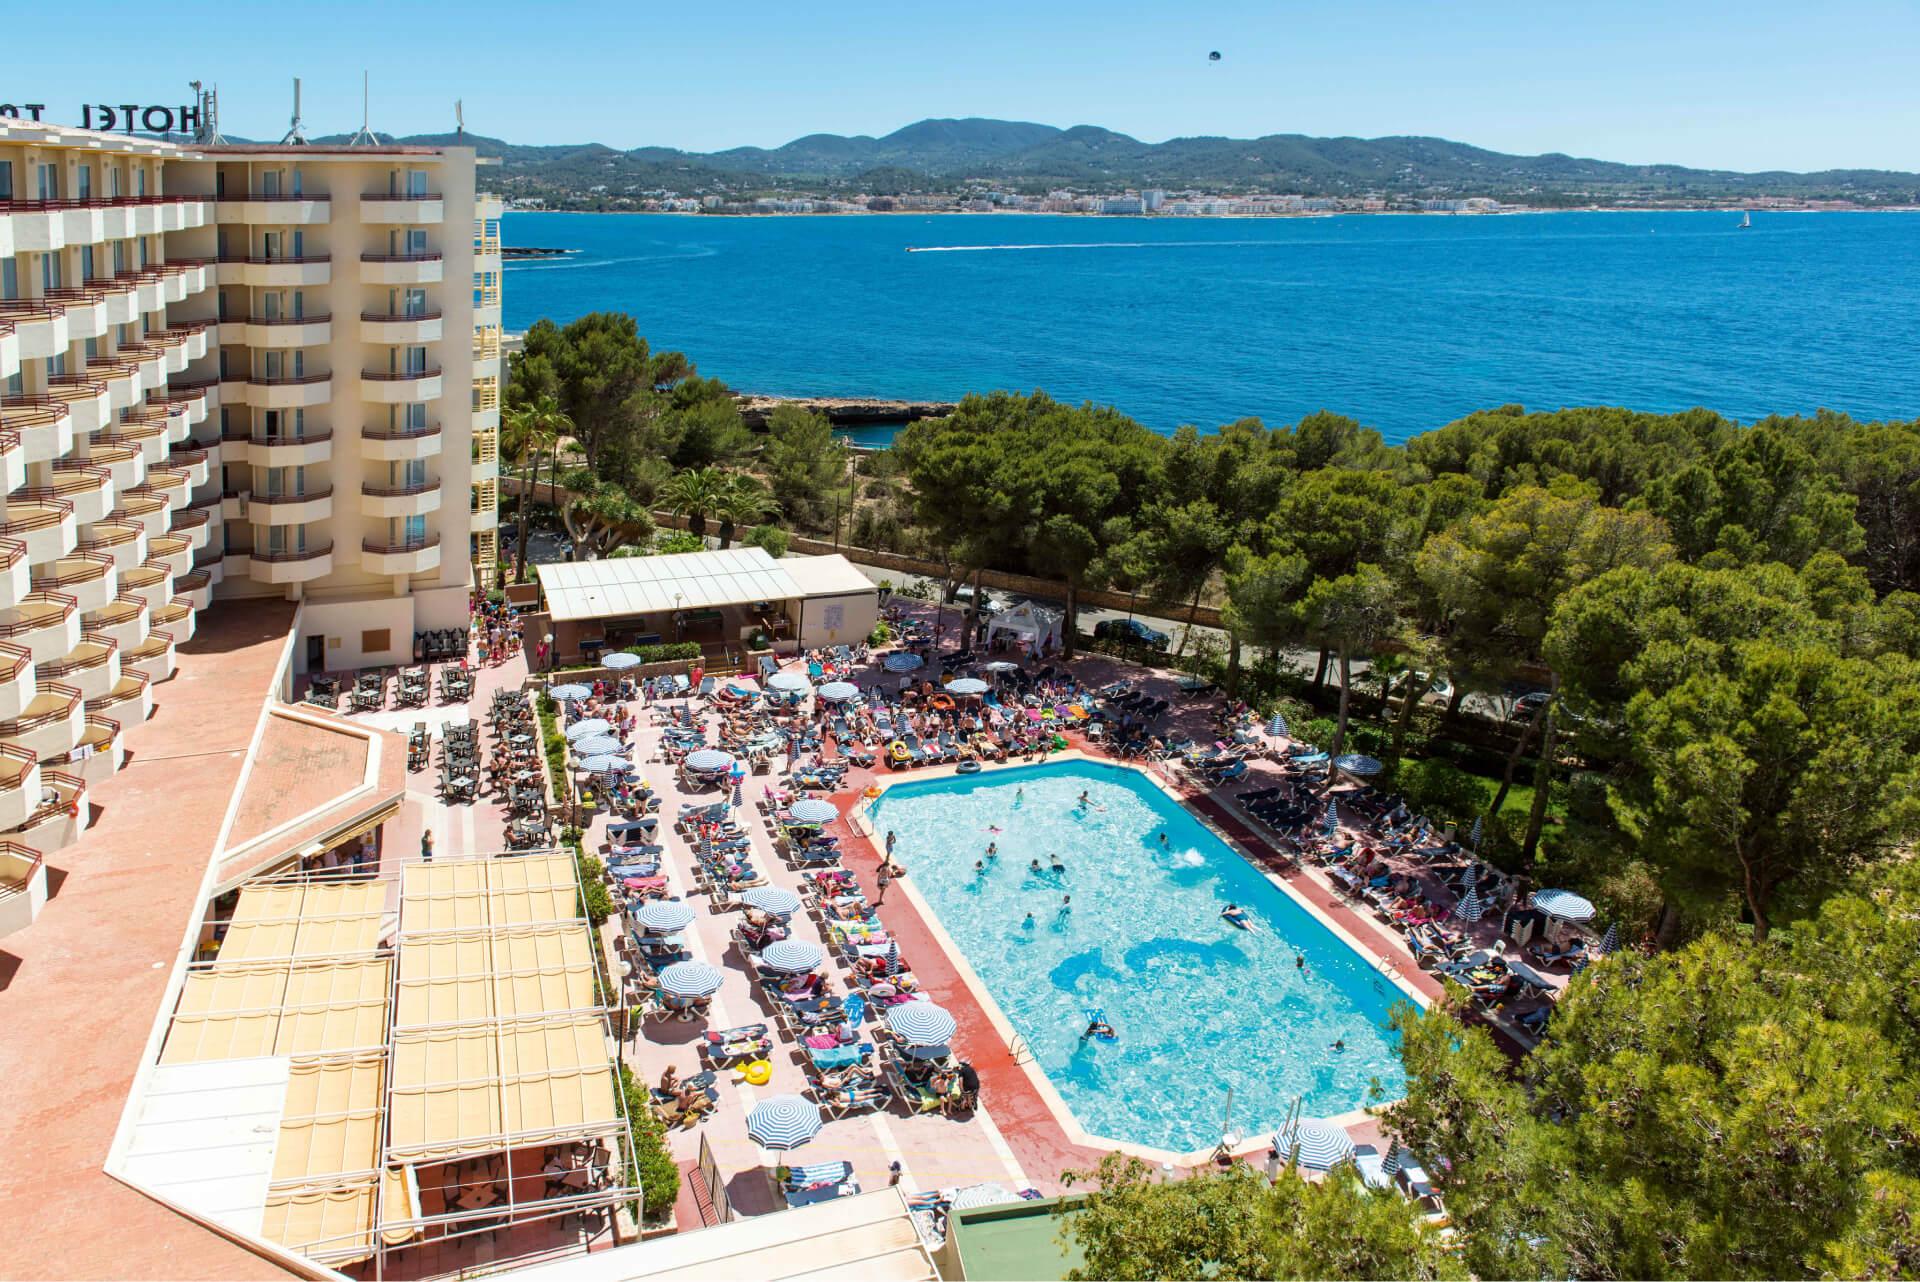 Fiesta Tanit Hotel Ibiza Holiday Hypermarket